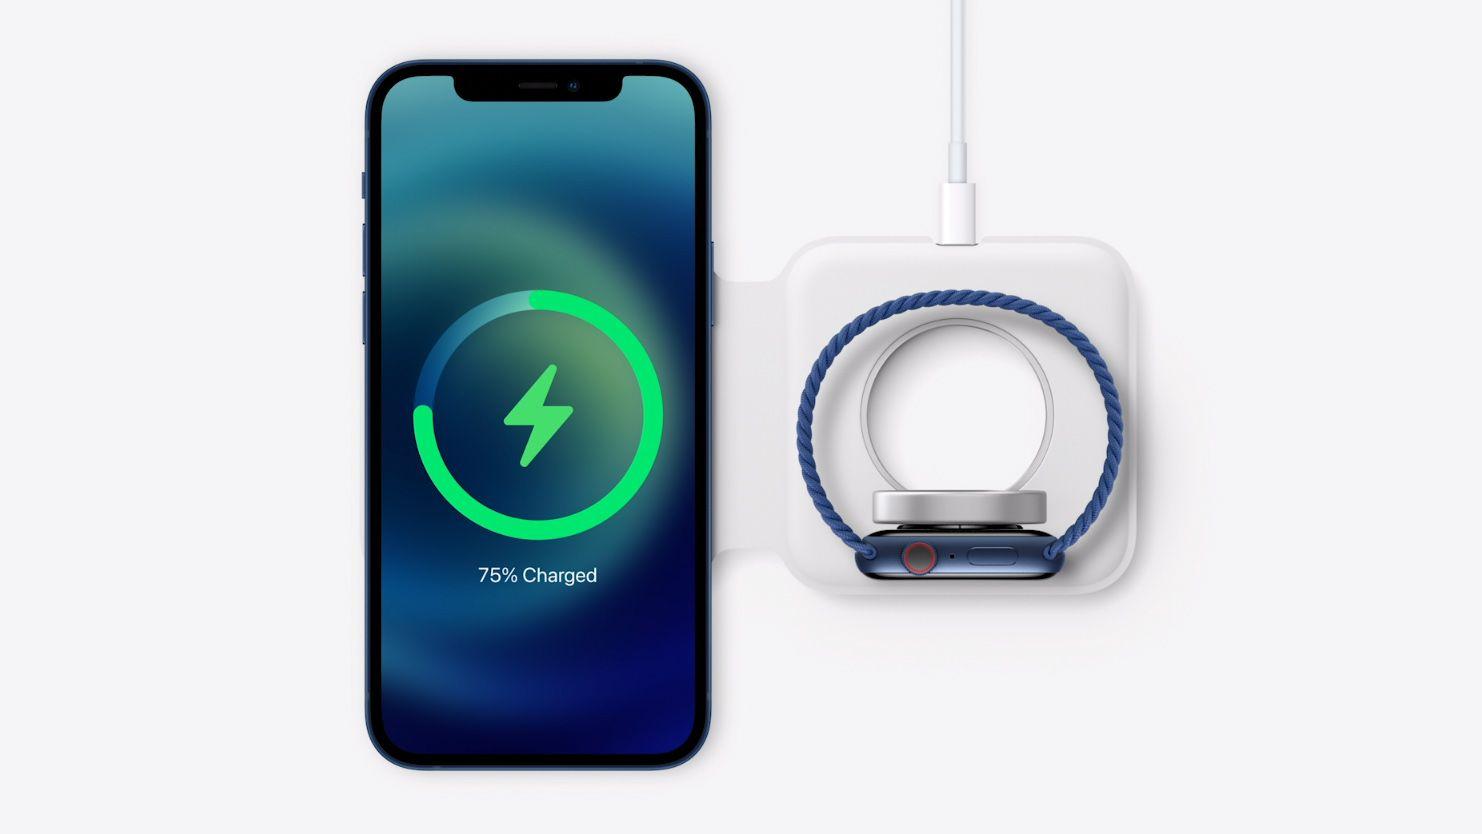 Apple lanserer også en ny trådløs lader. Ikke helt Airpower, men i alle fall nærmere.